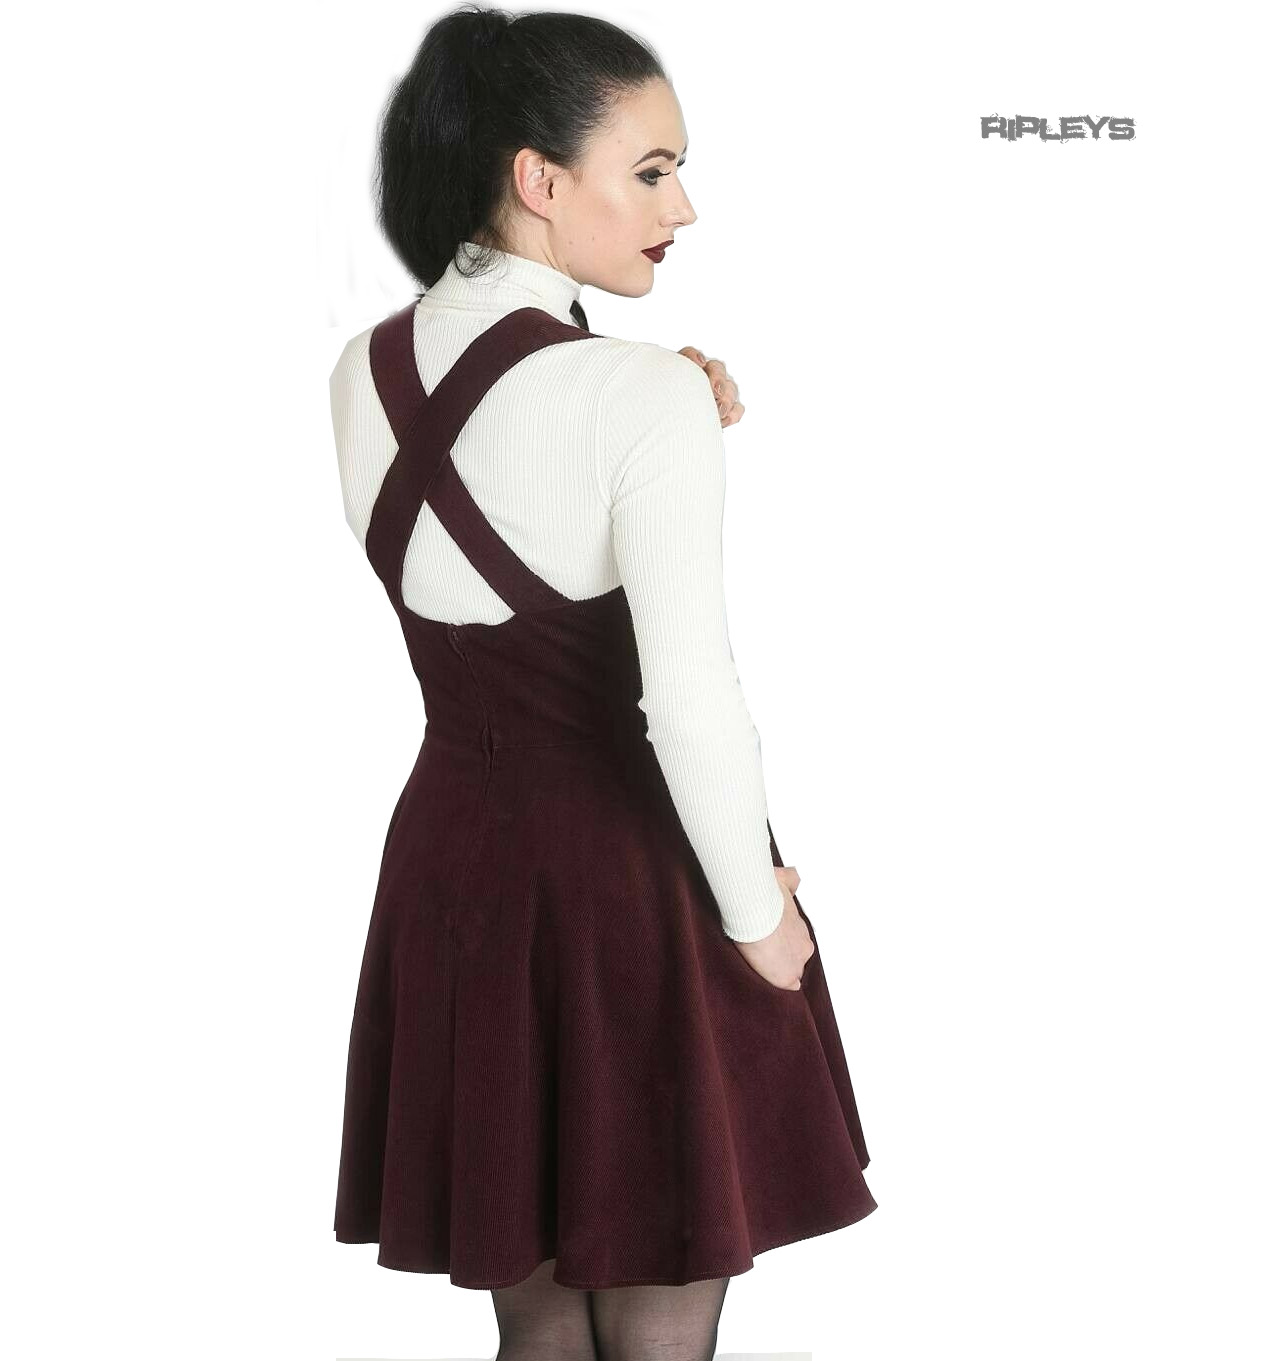 Hell-Bunny-Rockabilly-Corduroy-Mini-Dress-WONDER-YEARS-Pinafore-Wine-All-Sizes thumbnail 24